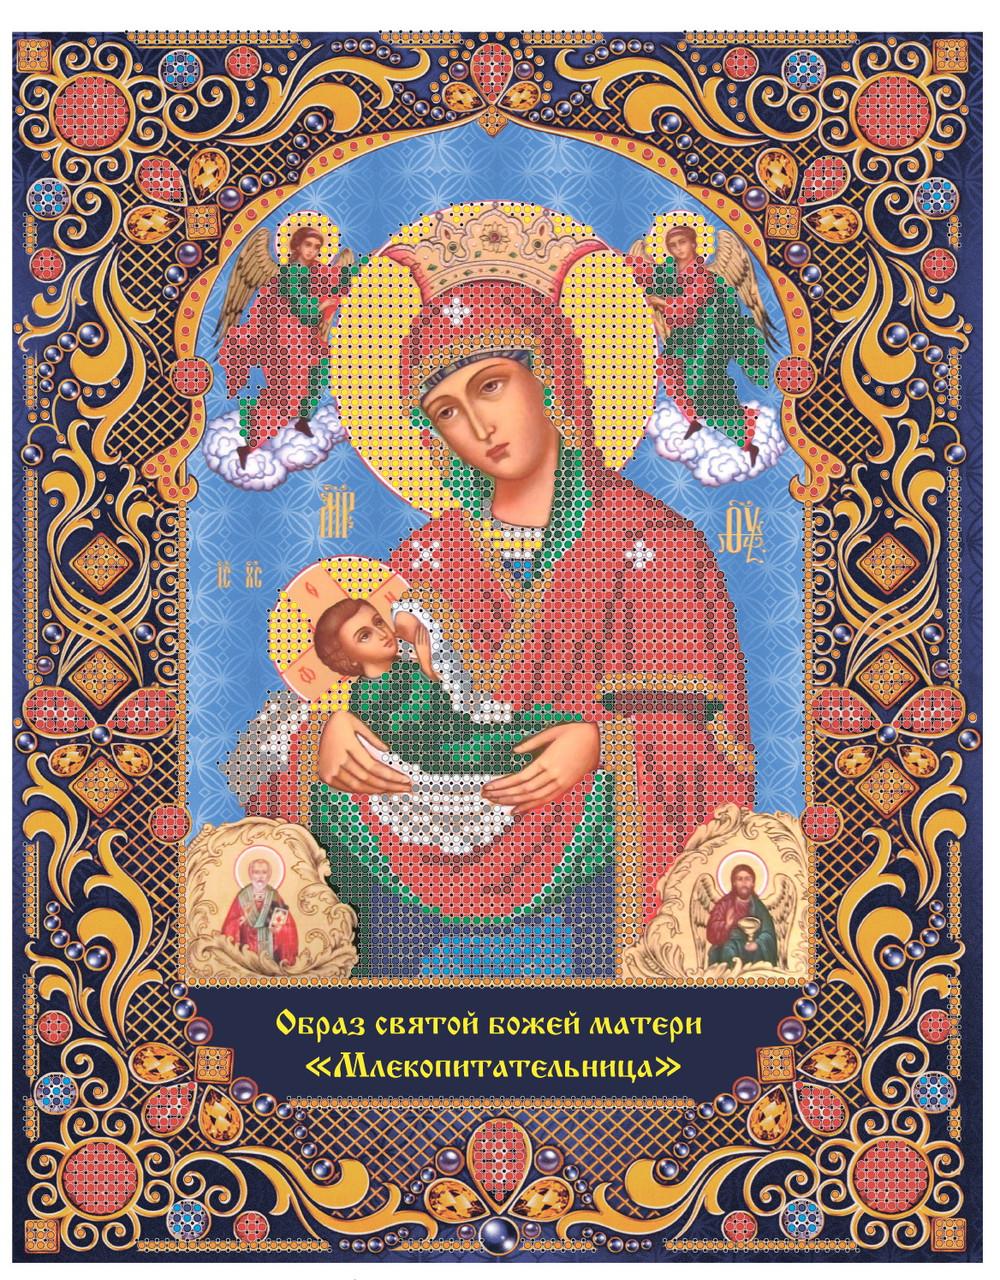 Ікона Божої Матері, іменована «Годувальниця»